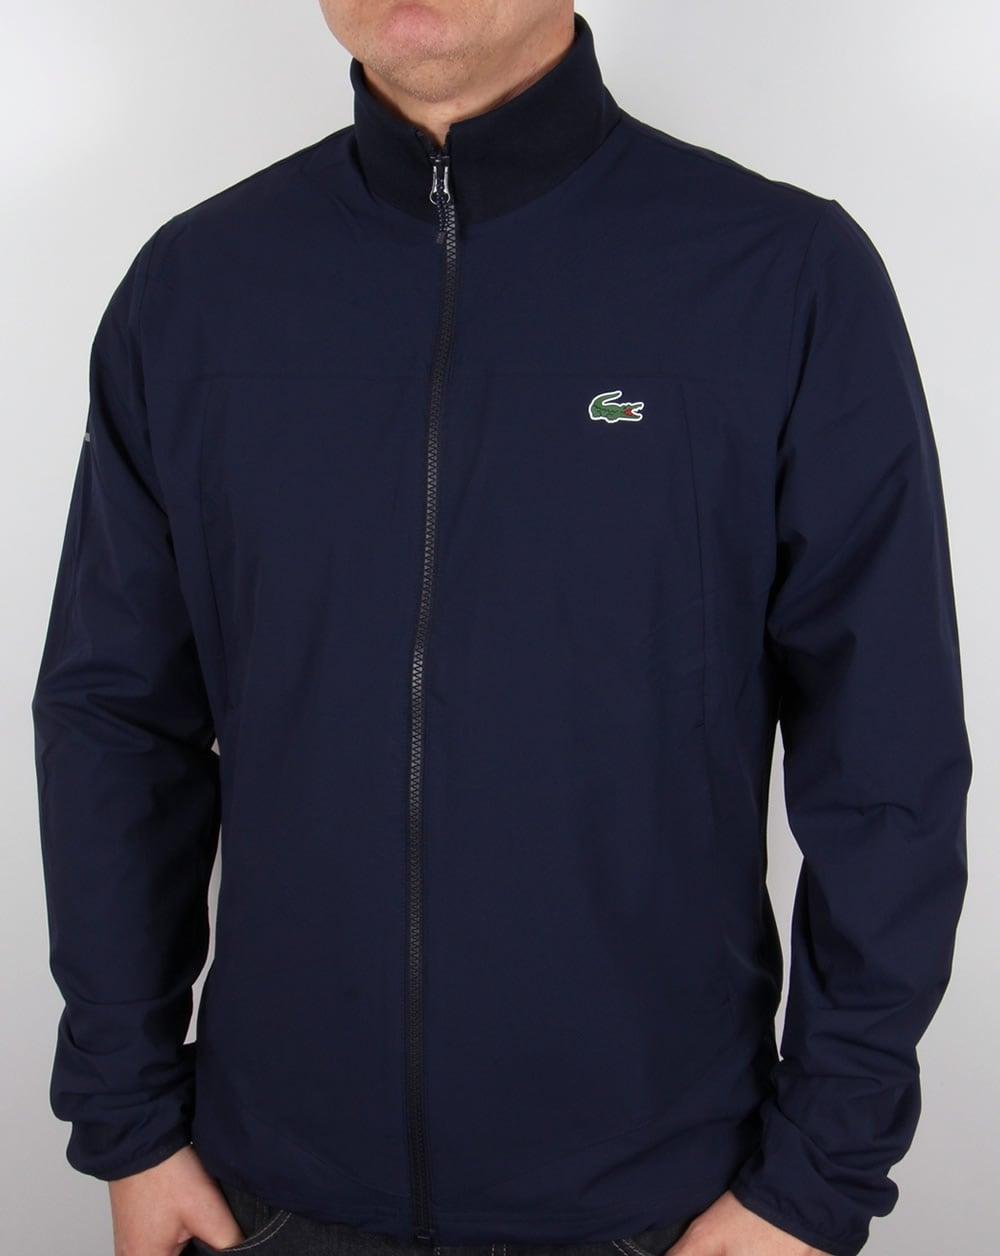 3038cf258 Lacoste Lacoste Zipped Jacket Navy